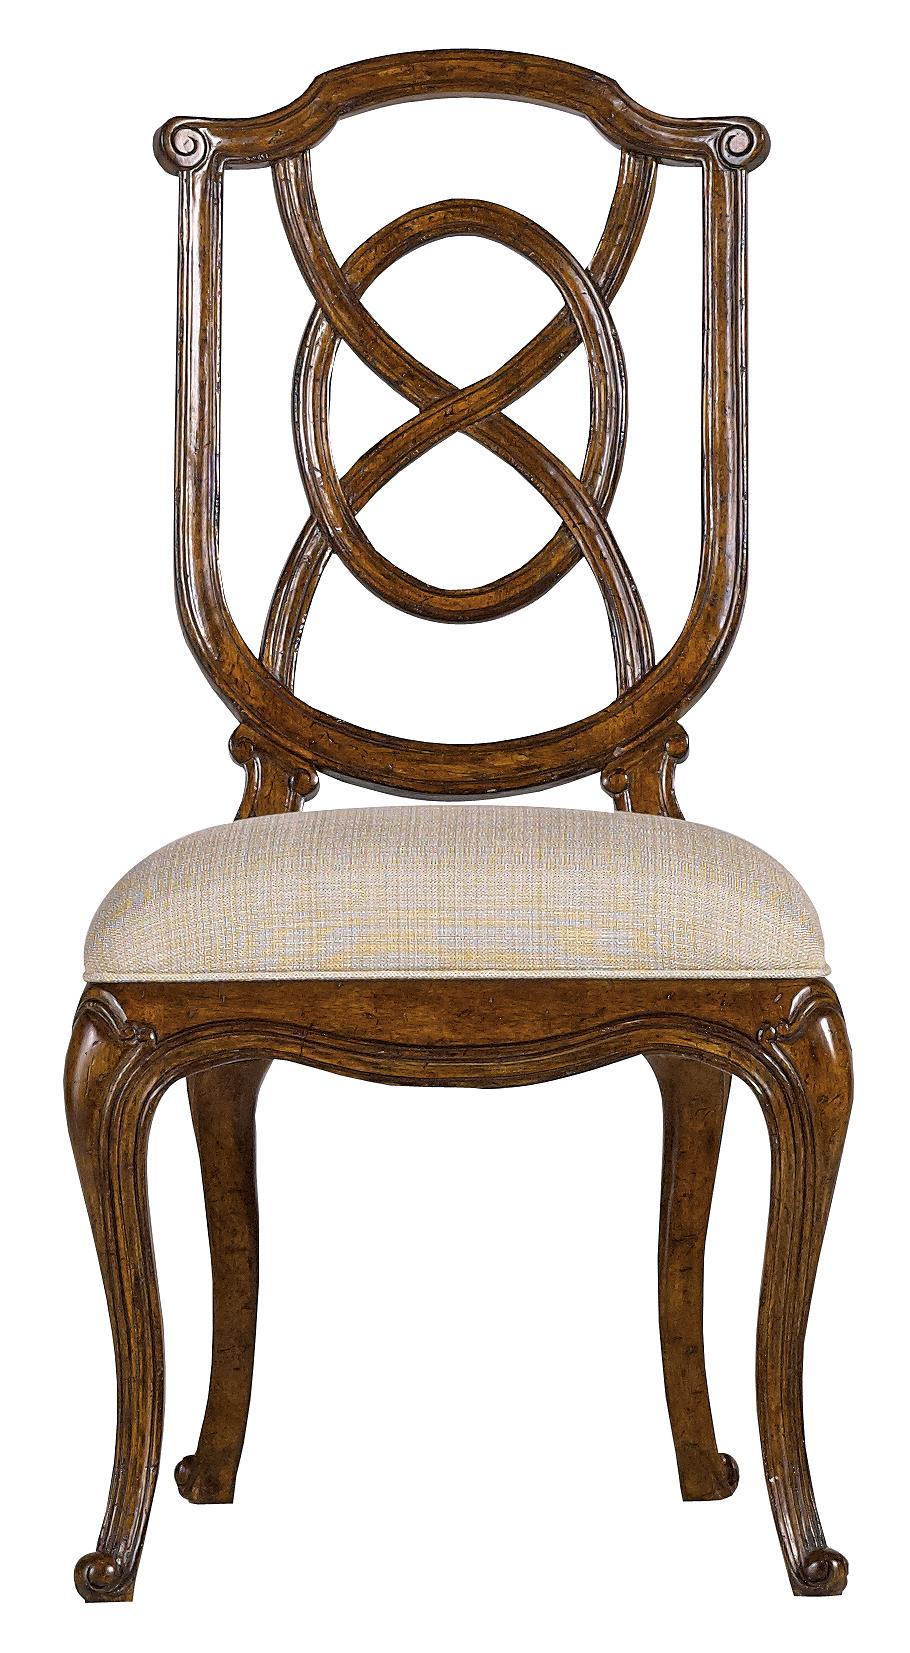 Stanley Furniture Arrondissement Tuileries Side Chair - Item Number: 222-11-60